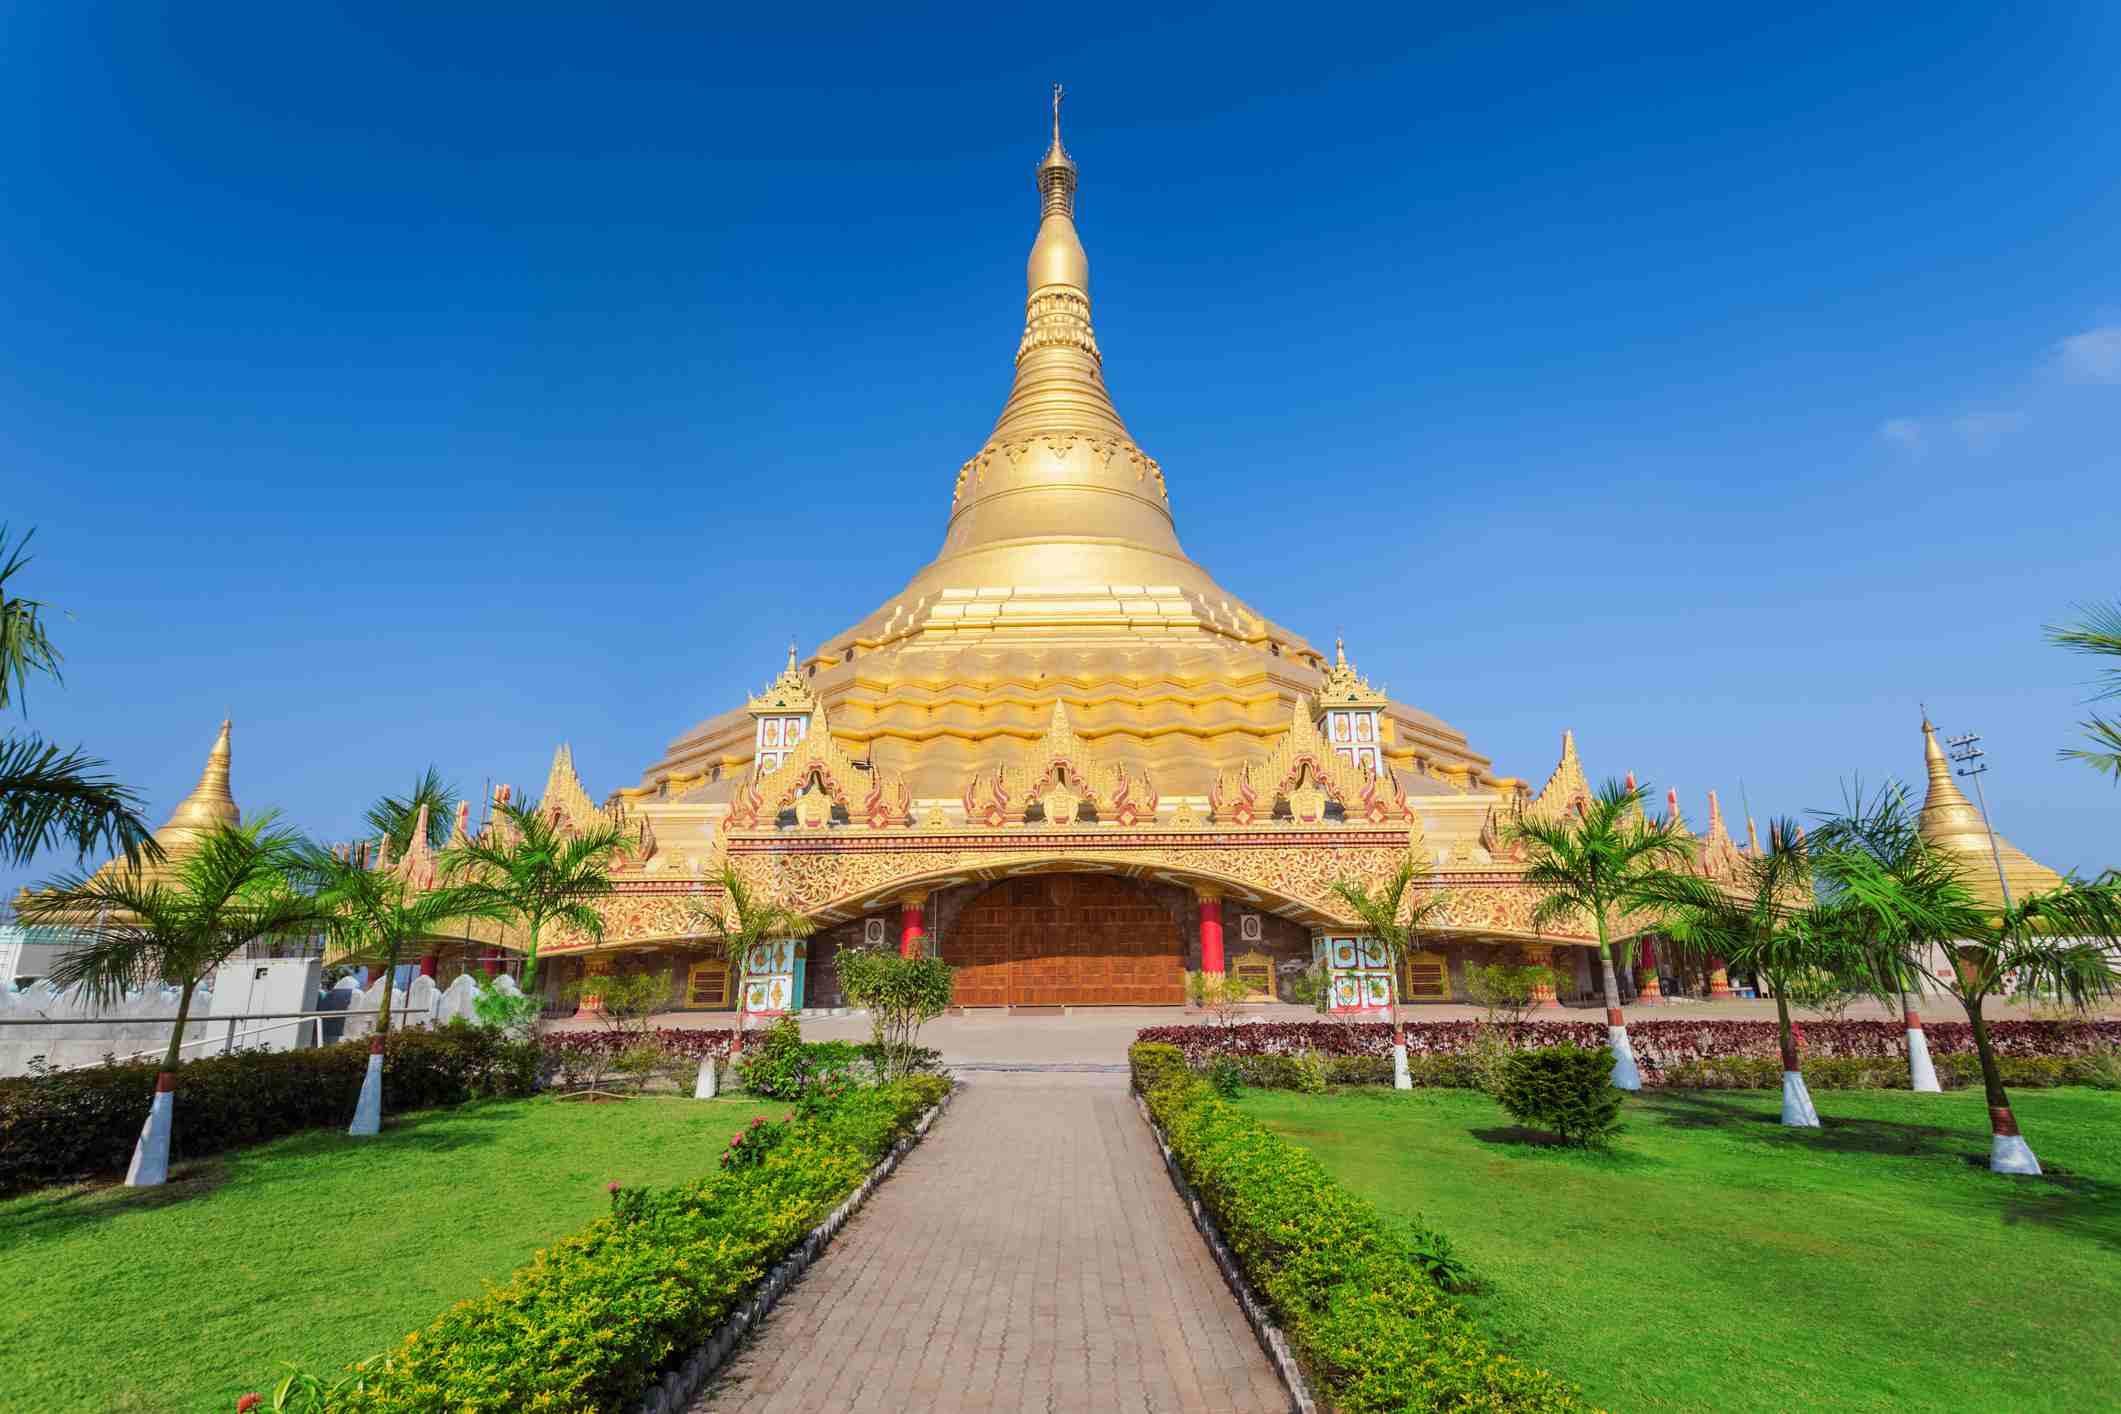 Plano lejano de la Pagoda Global Vipassana La Pagoda Global Vipassana es una Sala de Meditación en Mumbai, India